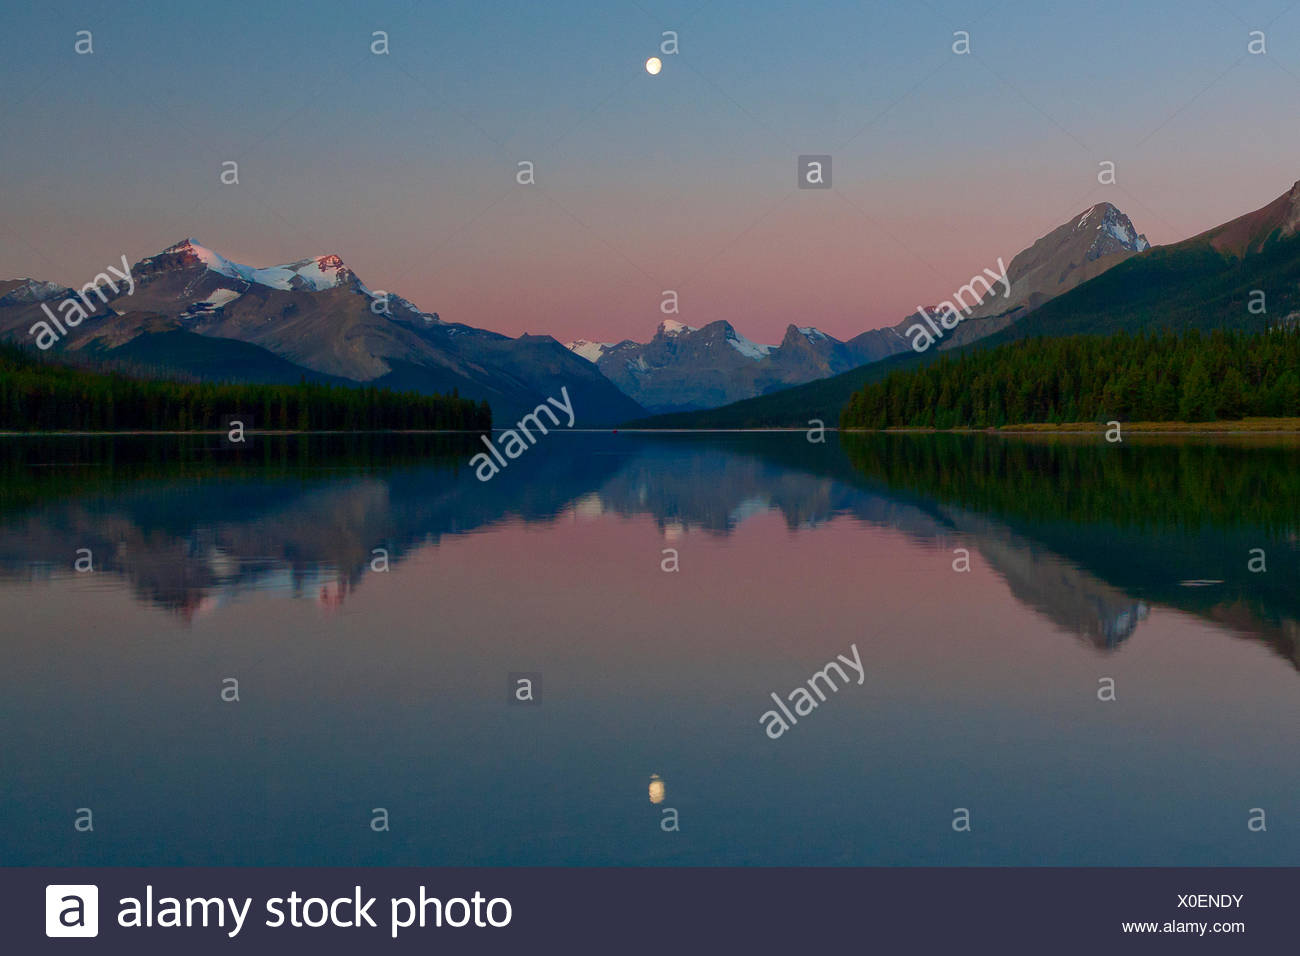 Kanada, Provinz, Natur, Landschaft, Rockies, kanadischen Rocky Mountains, Gebirge, See, Landschaft, Malign, Nationalpark, Jasper, Alberta Stockbild